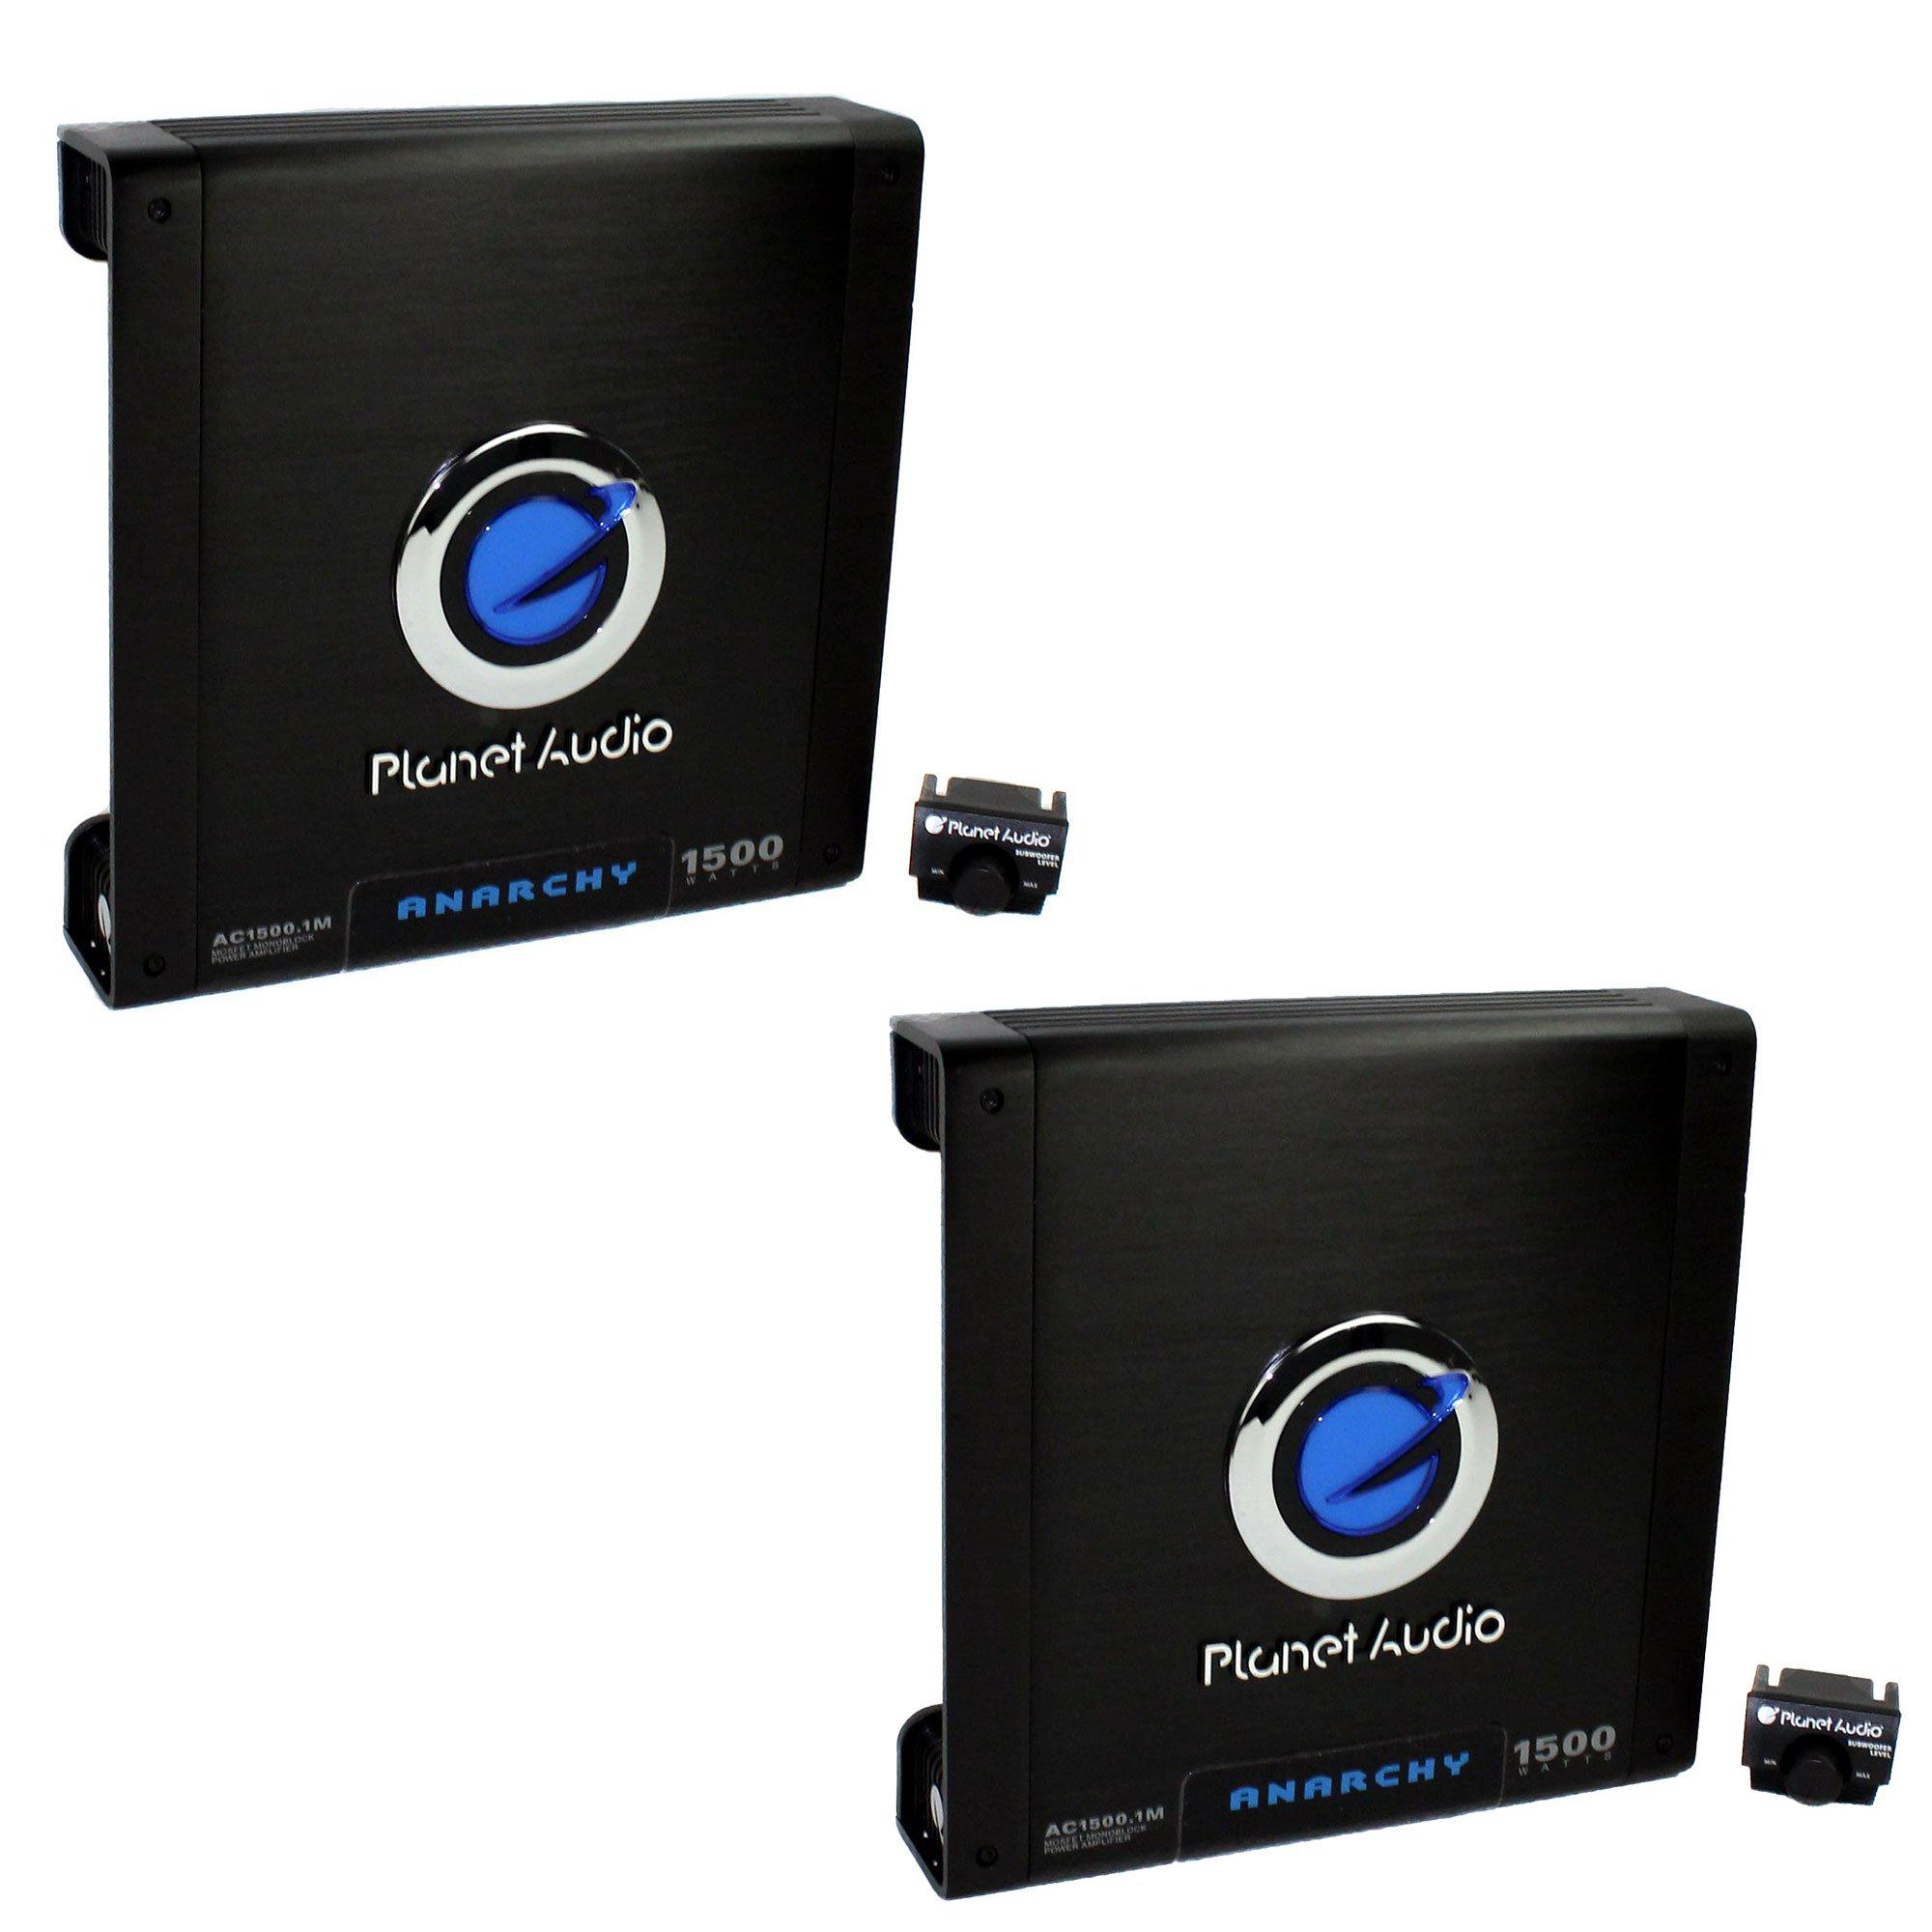 Planet Audio 1500 Watt Mono Block Car Audio Amplifier with Remote (2 Pack)